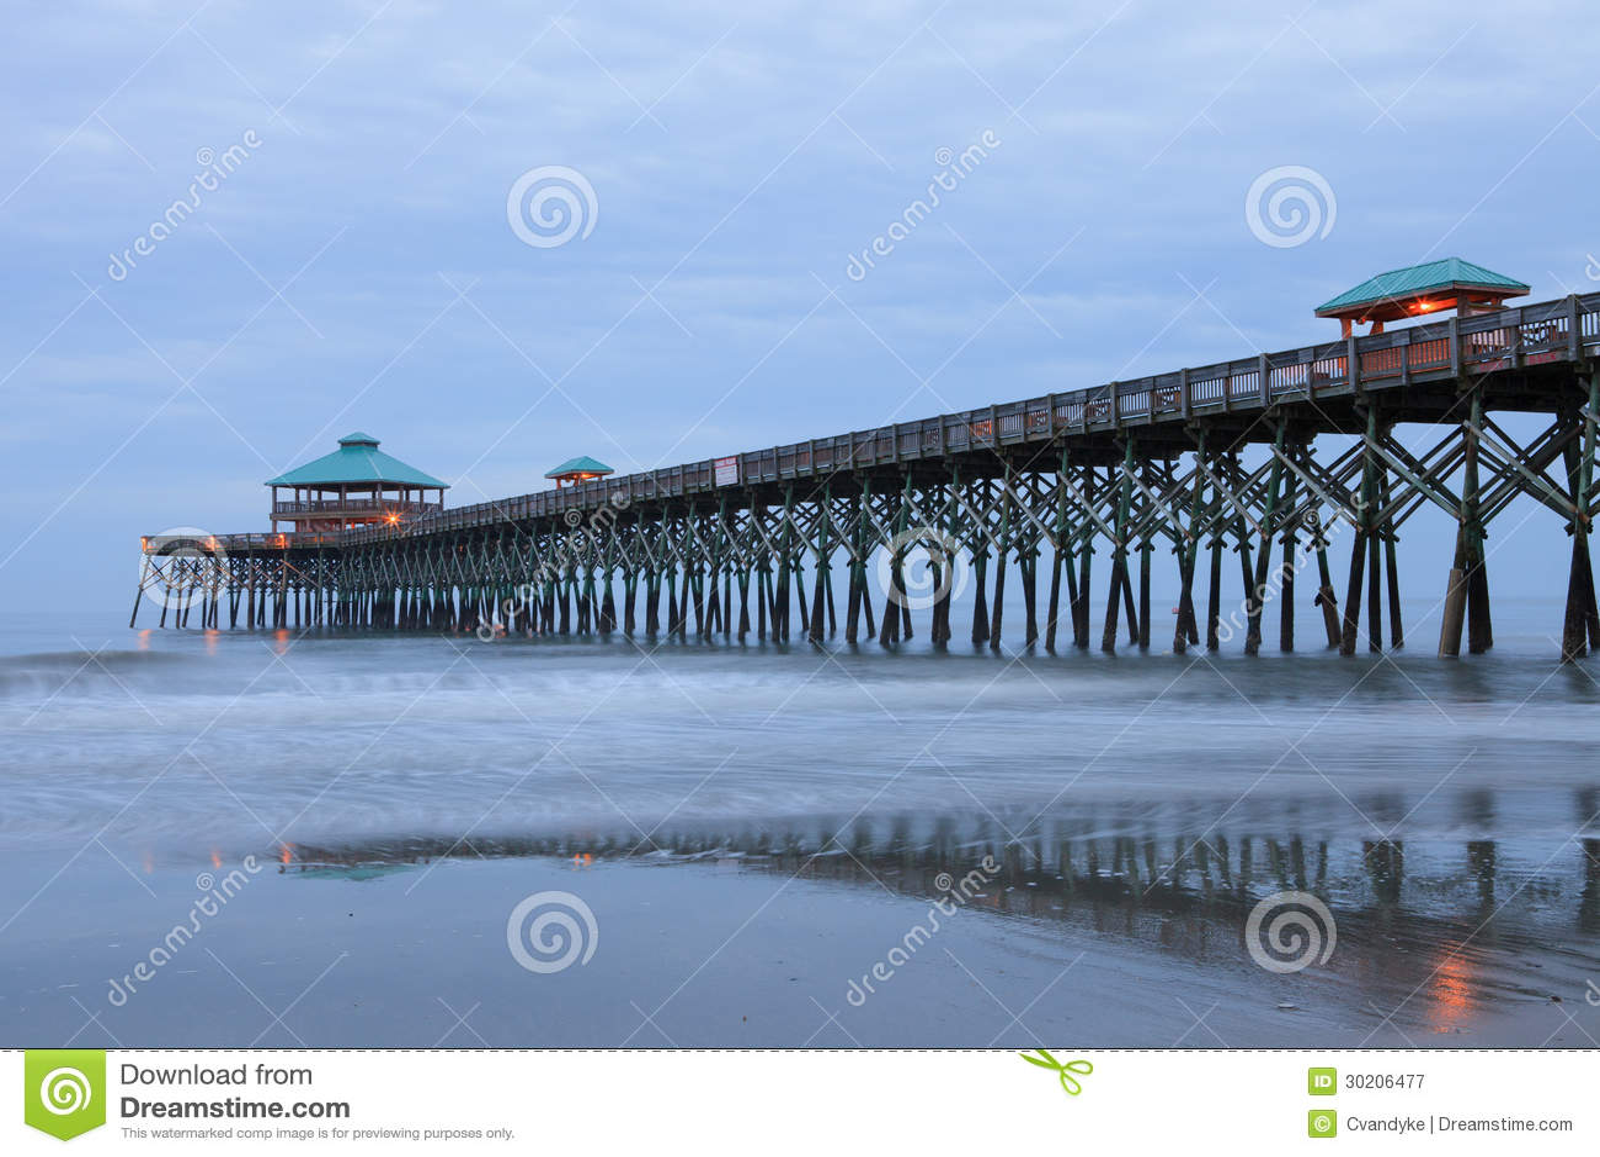 Charleston Folly Beach SC Pier South Carolina